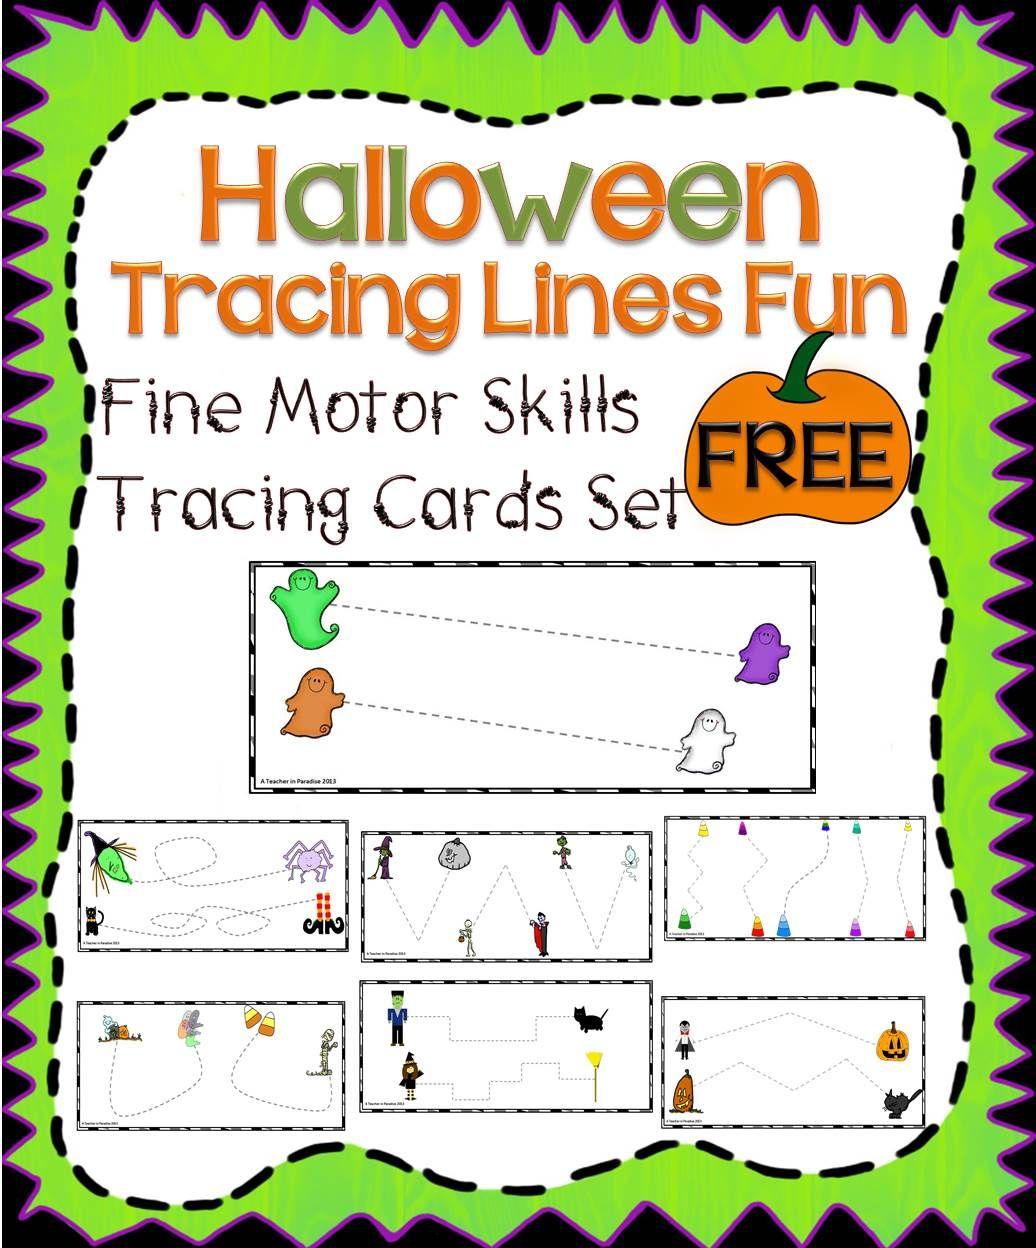 Halloween Tracing Lines Fun Fine Motor Skills Tracing Cards Set